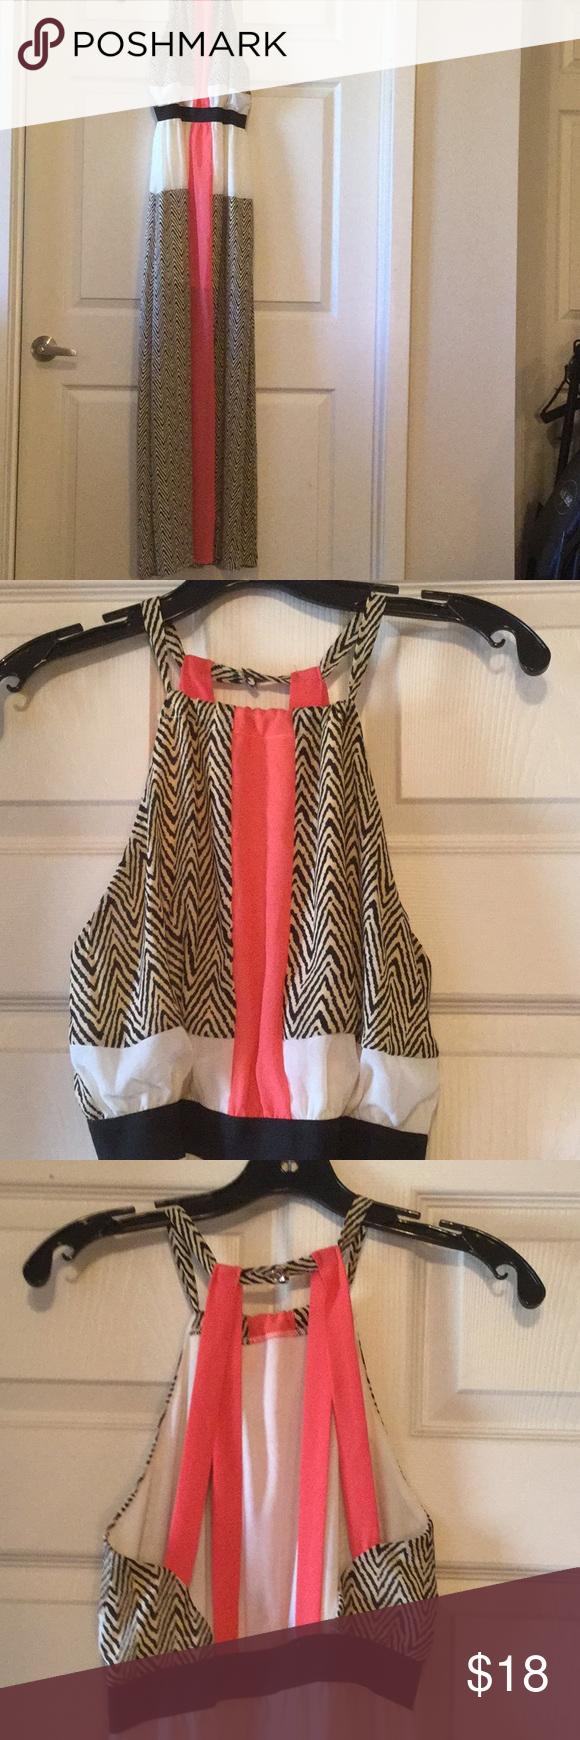 Xtaren dresses shorts and customer support